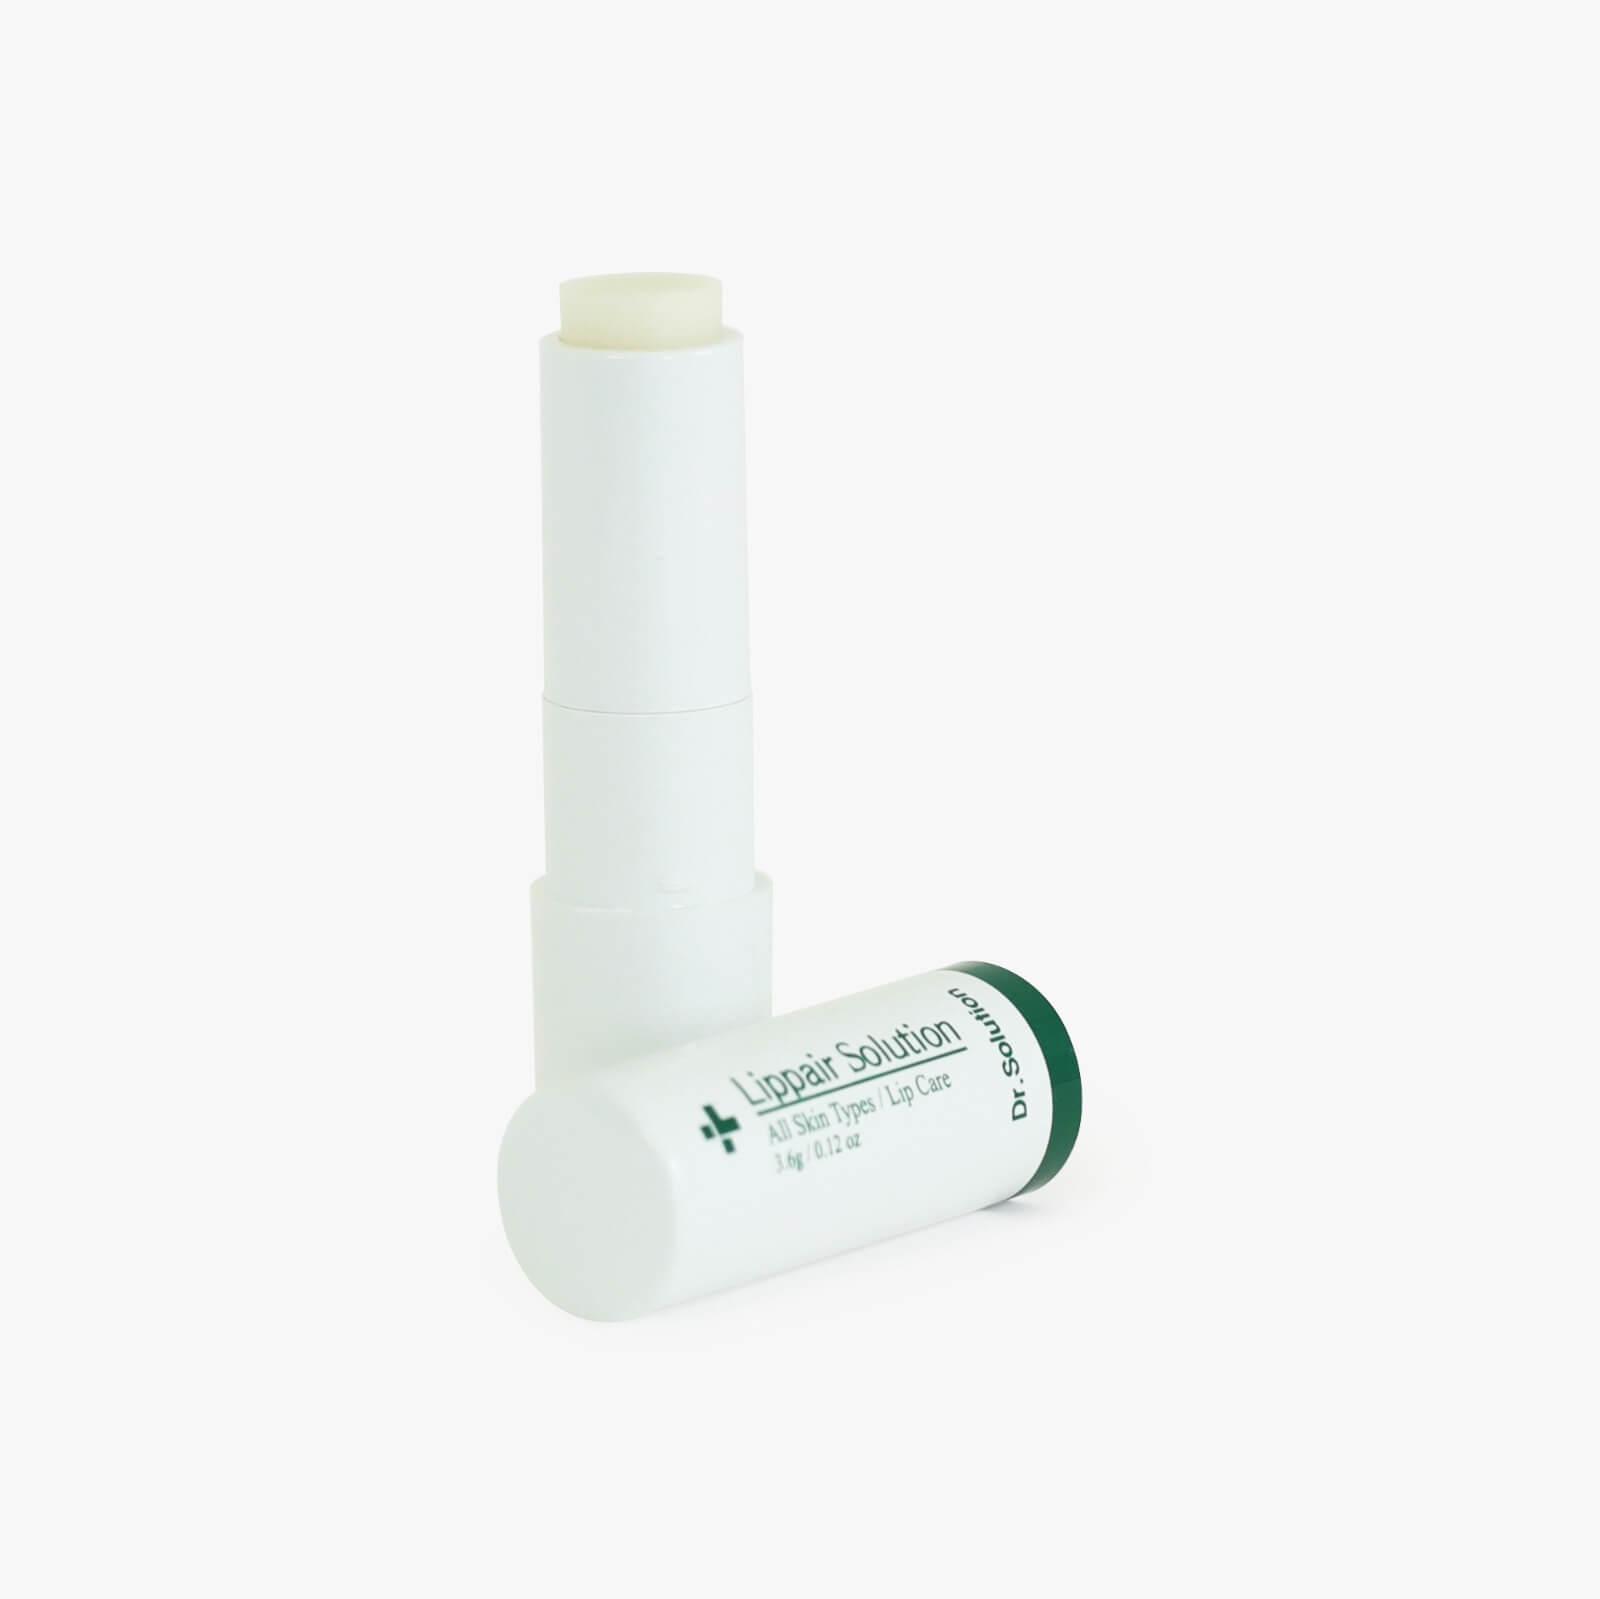 Бальзам для губ CUSKIN Lippair Solution